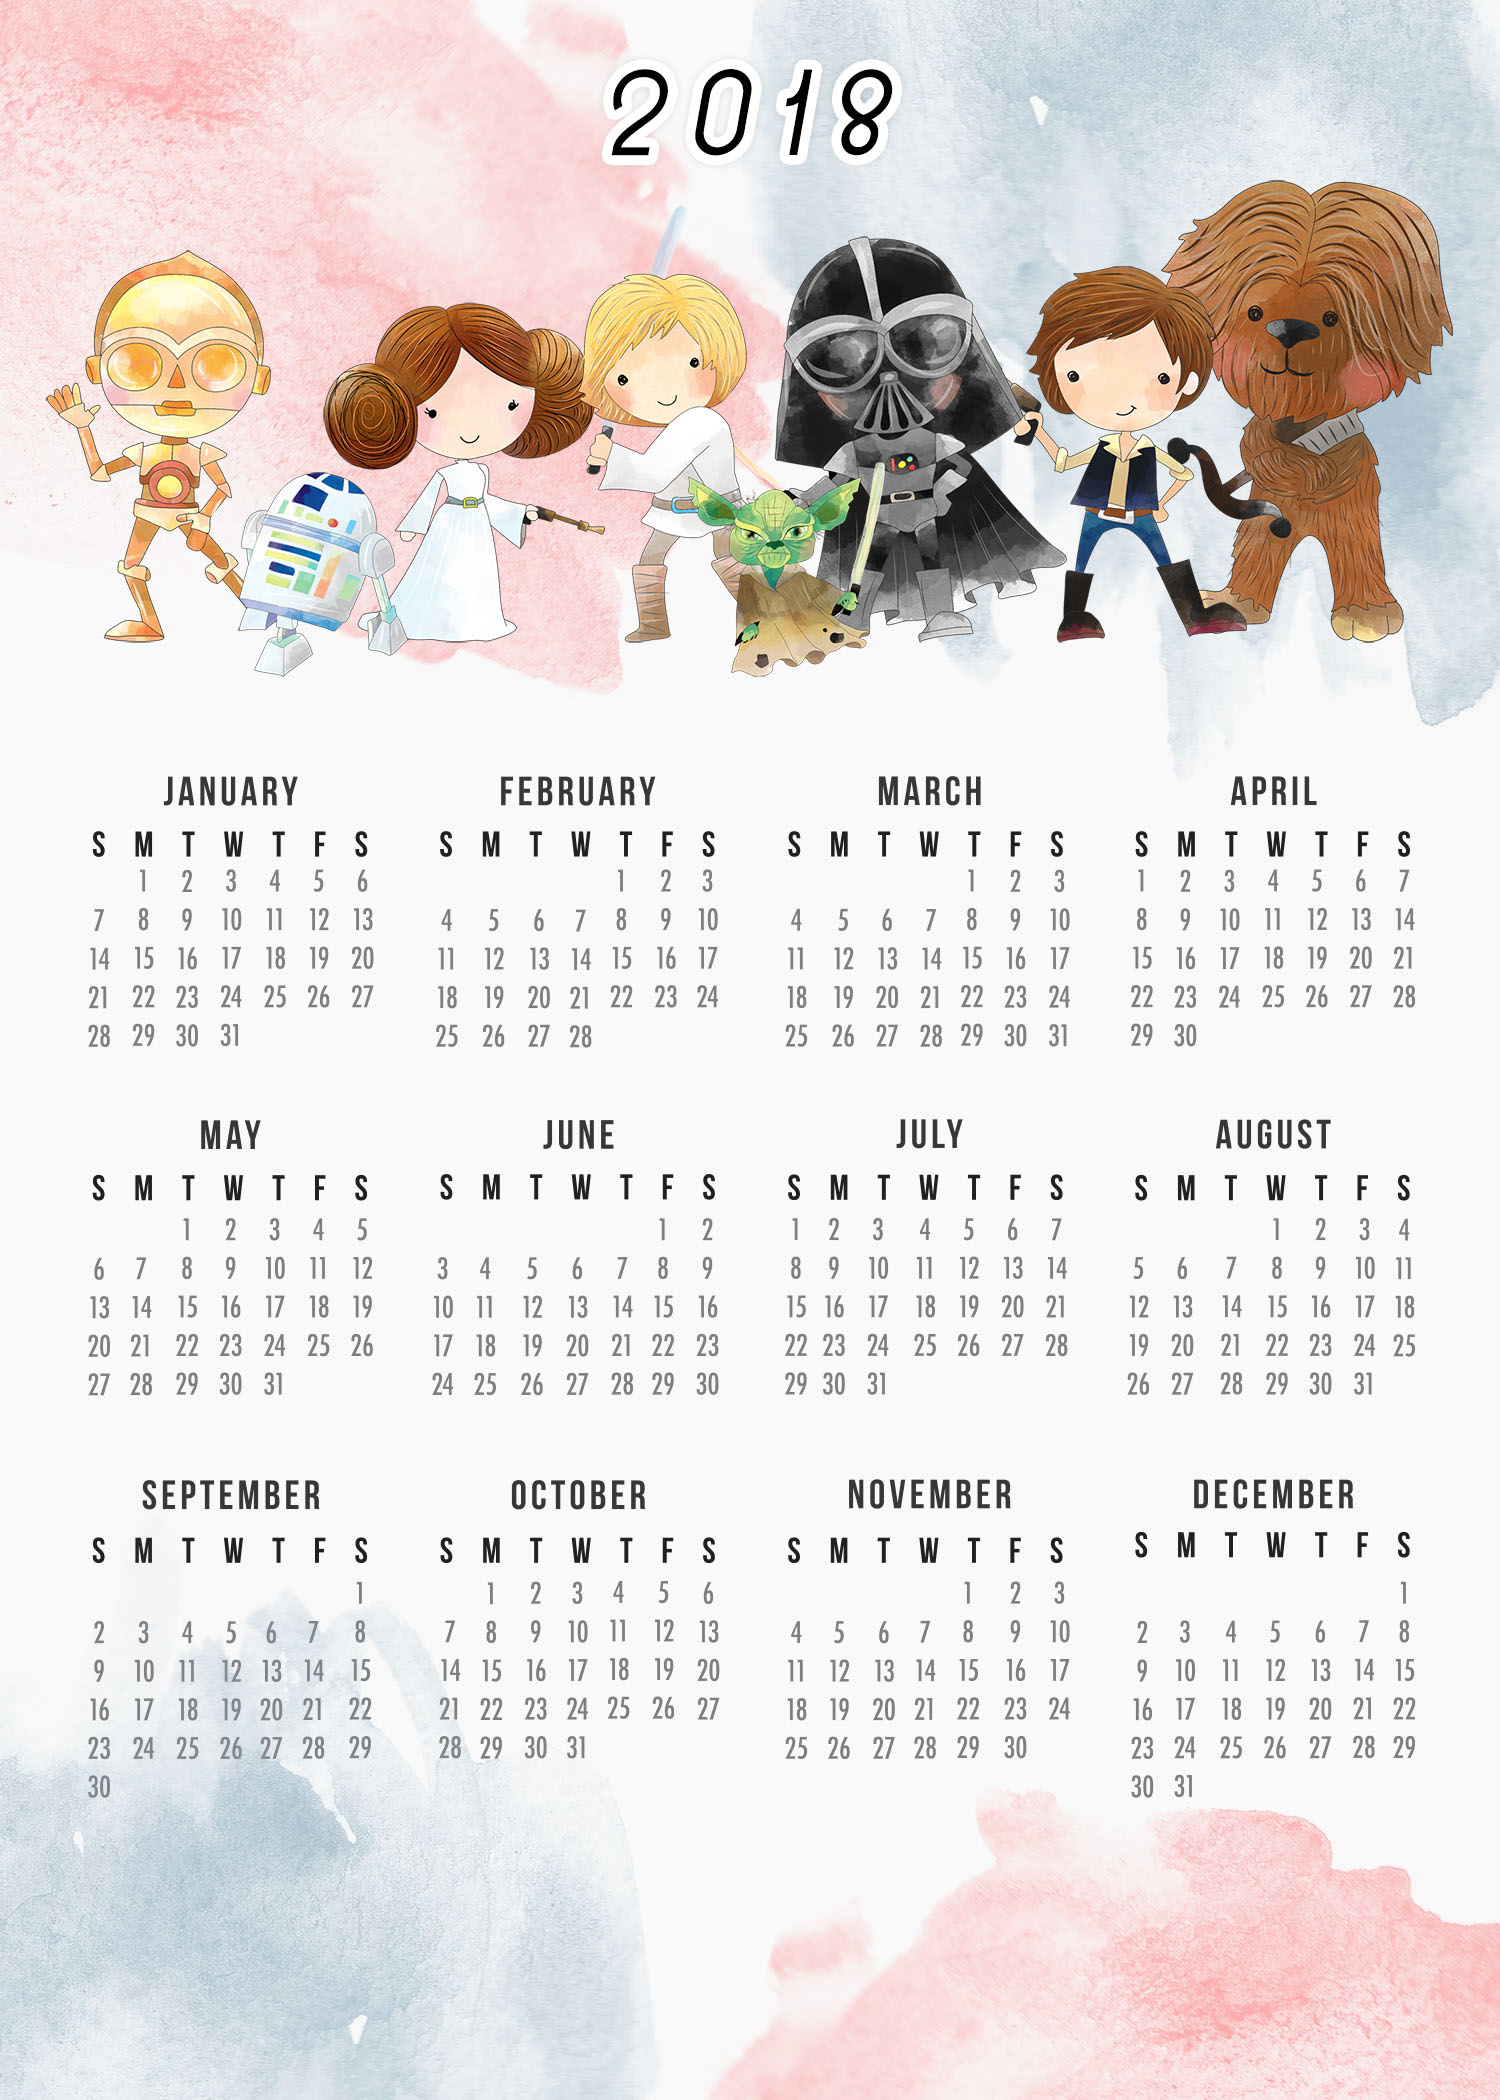 Free Printable 2018 Star Wars Calendar /// One Page /// Original